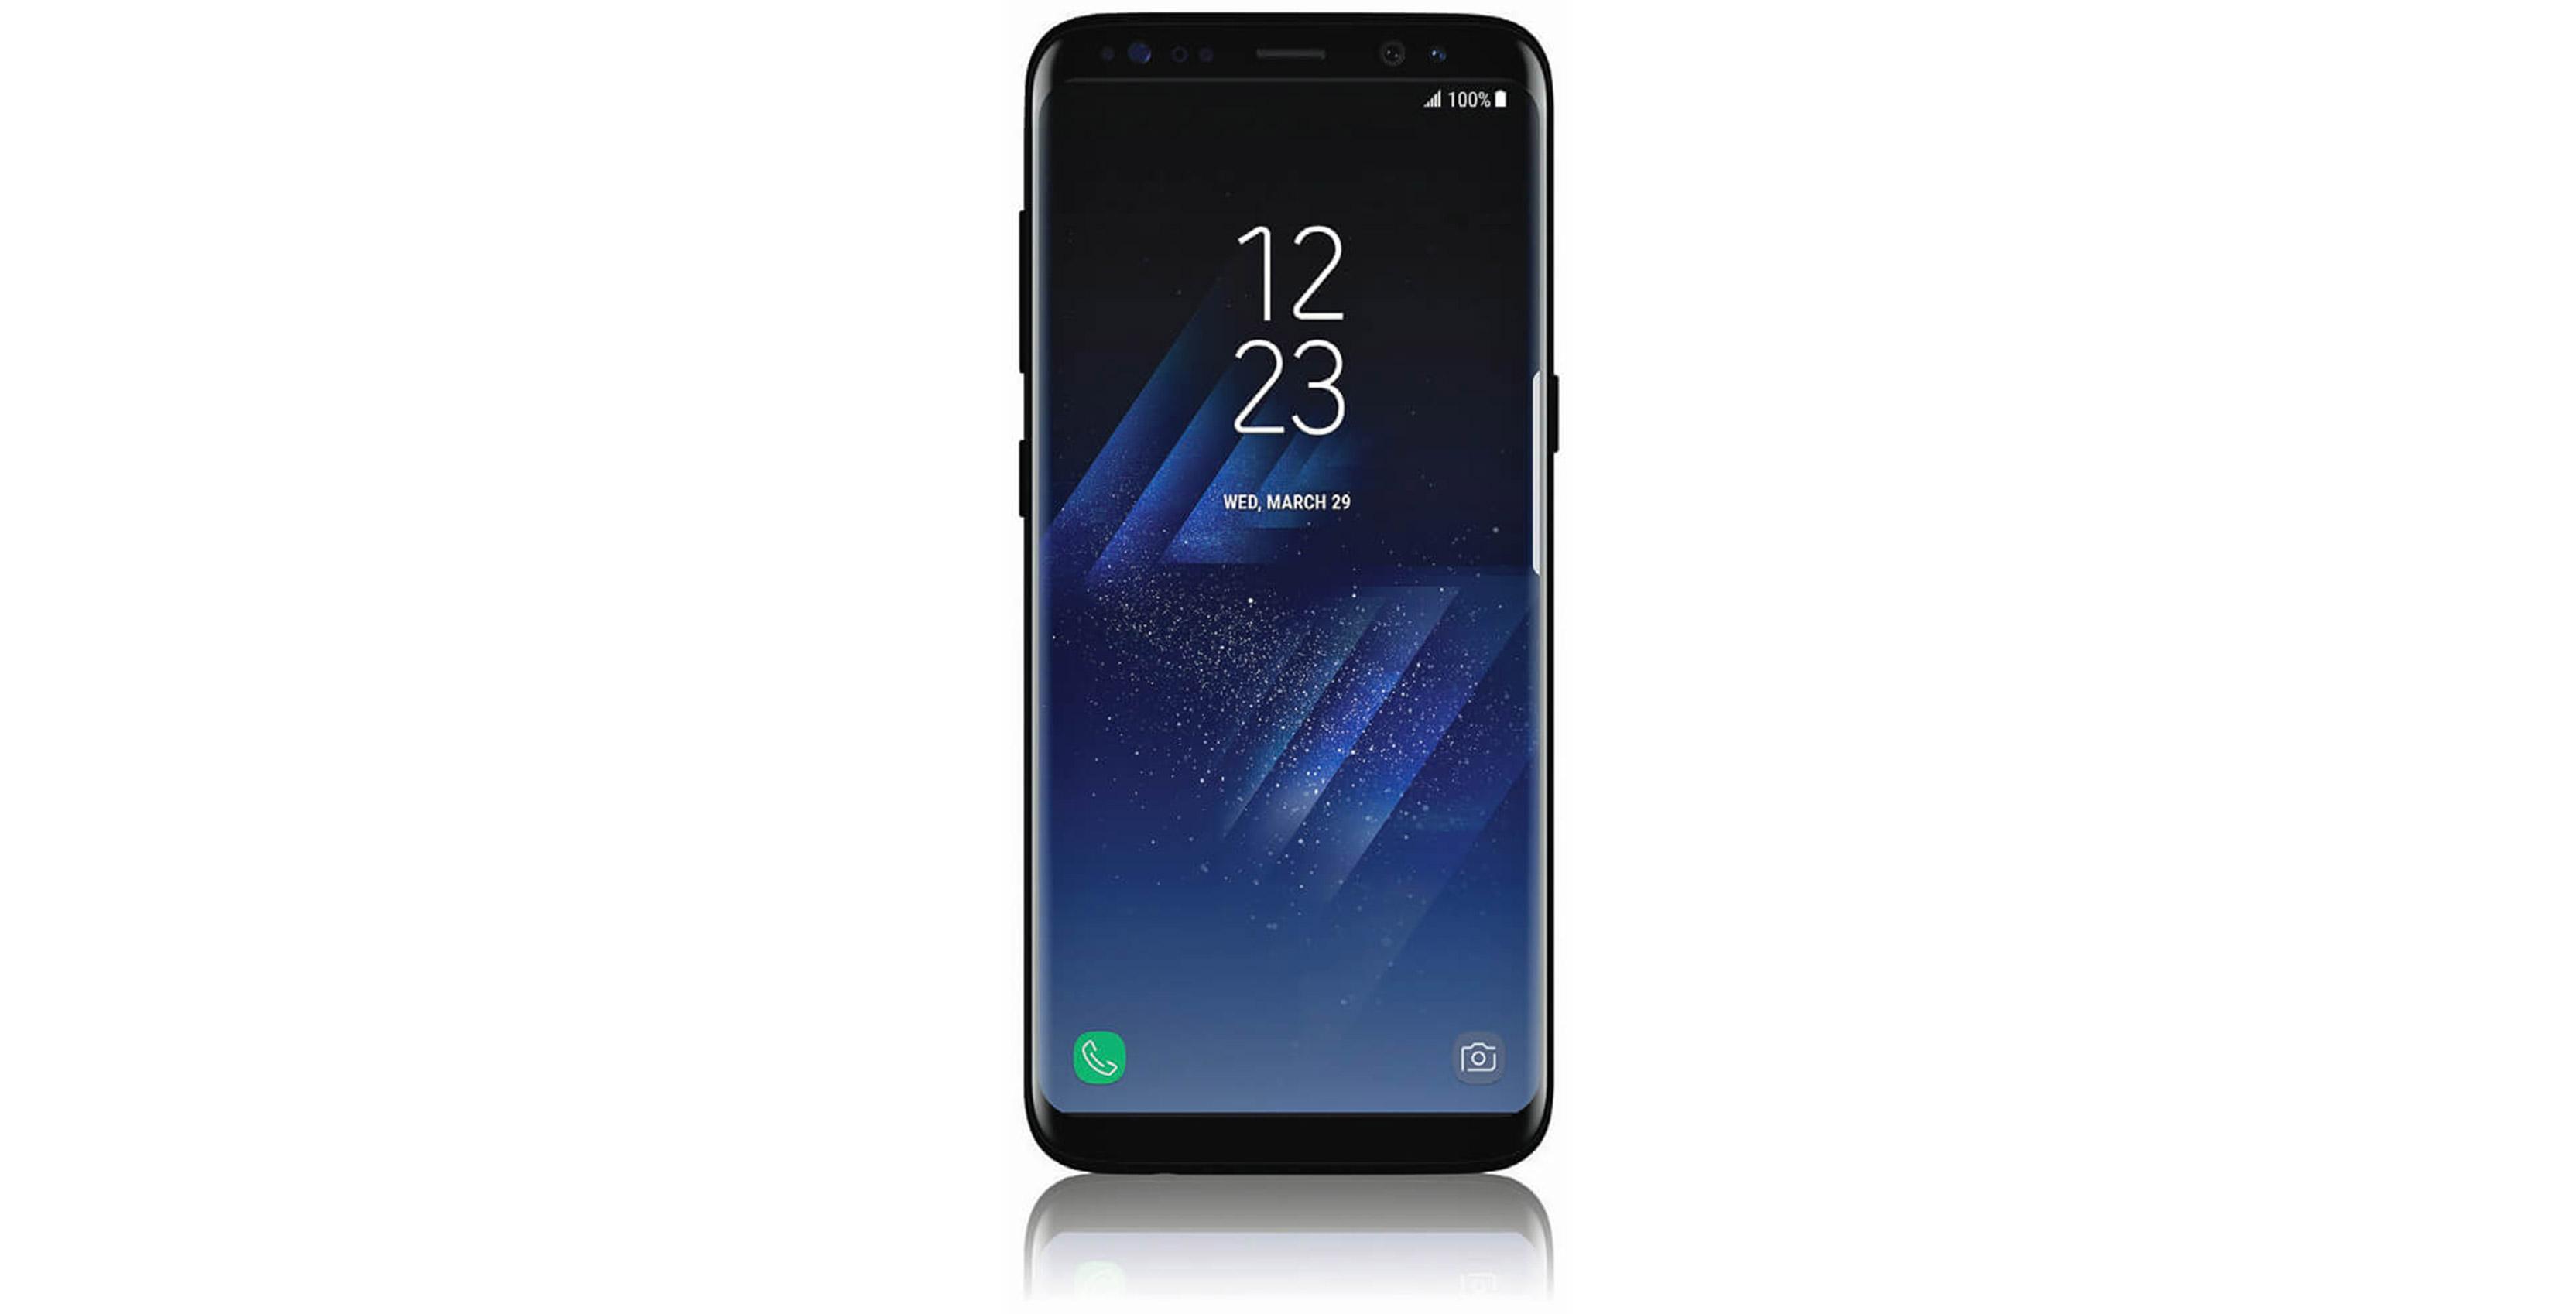 leak of Samsung Galaxy S8 smartphone